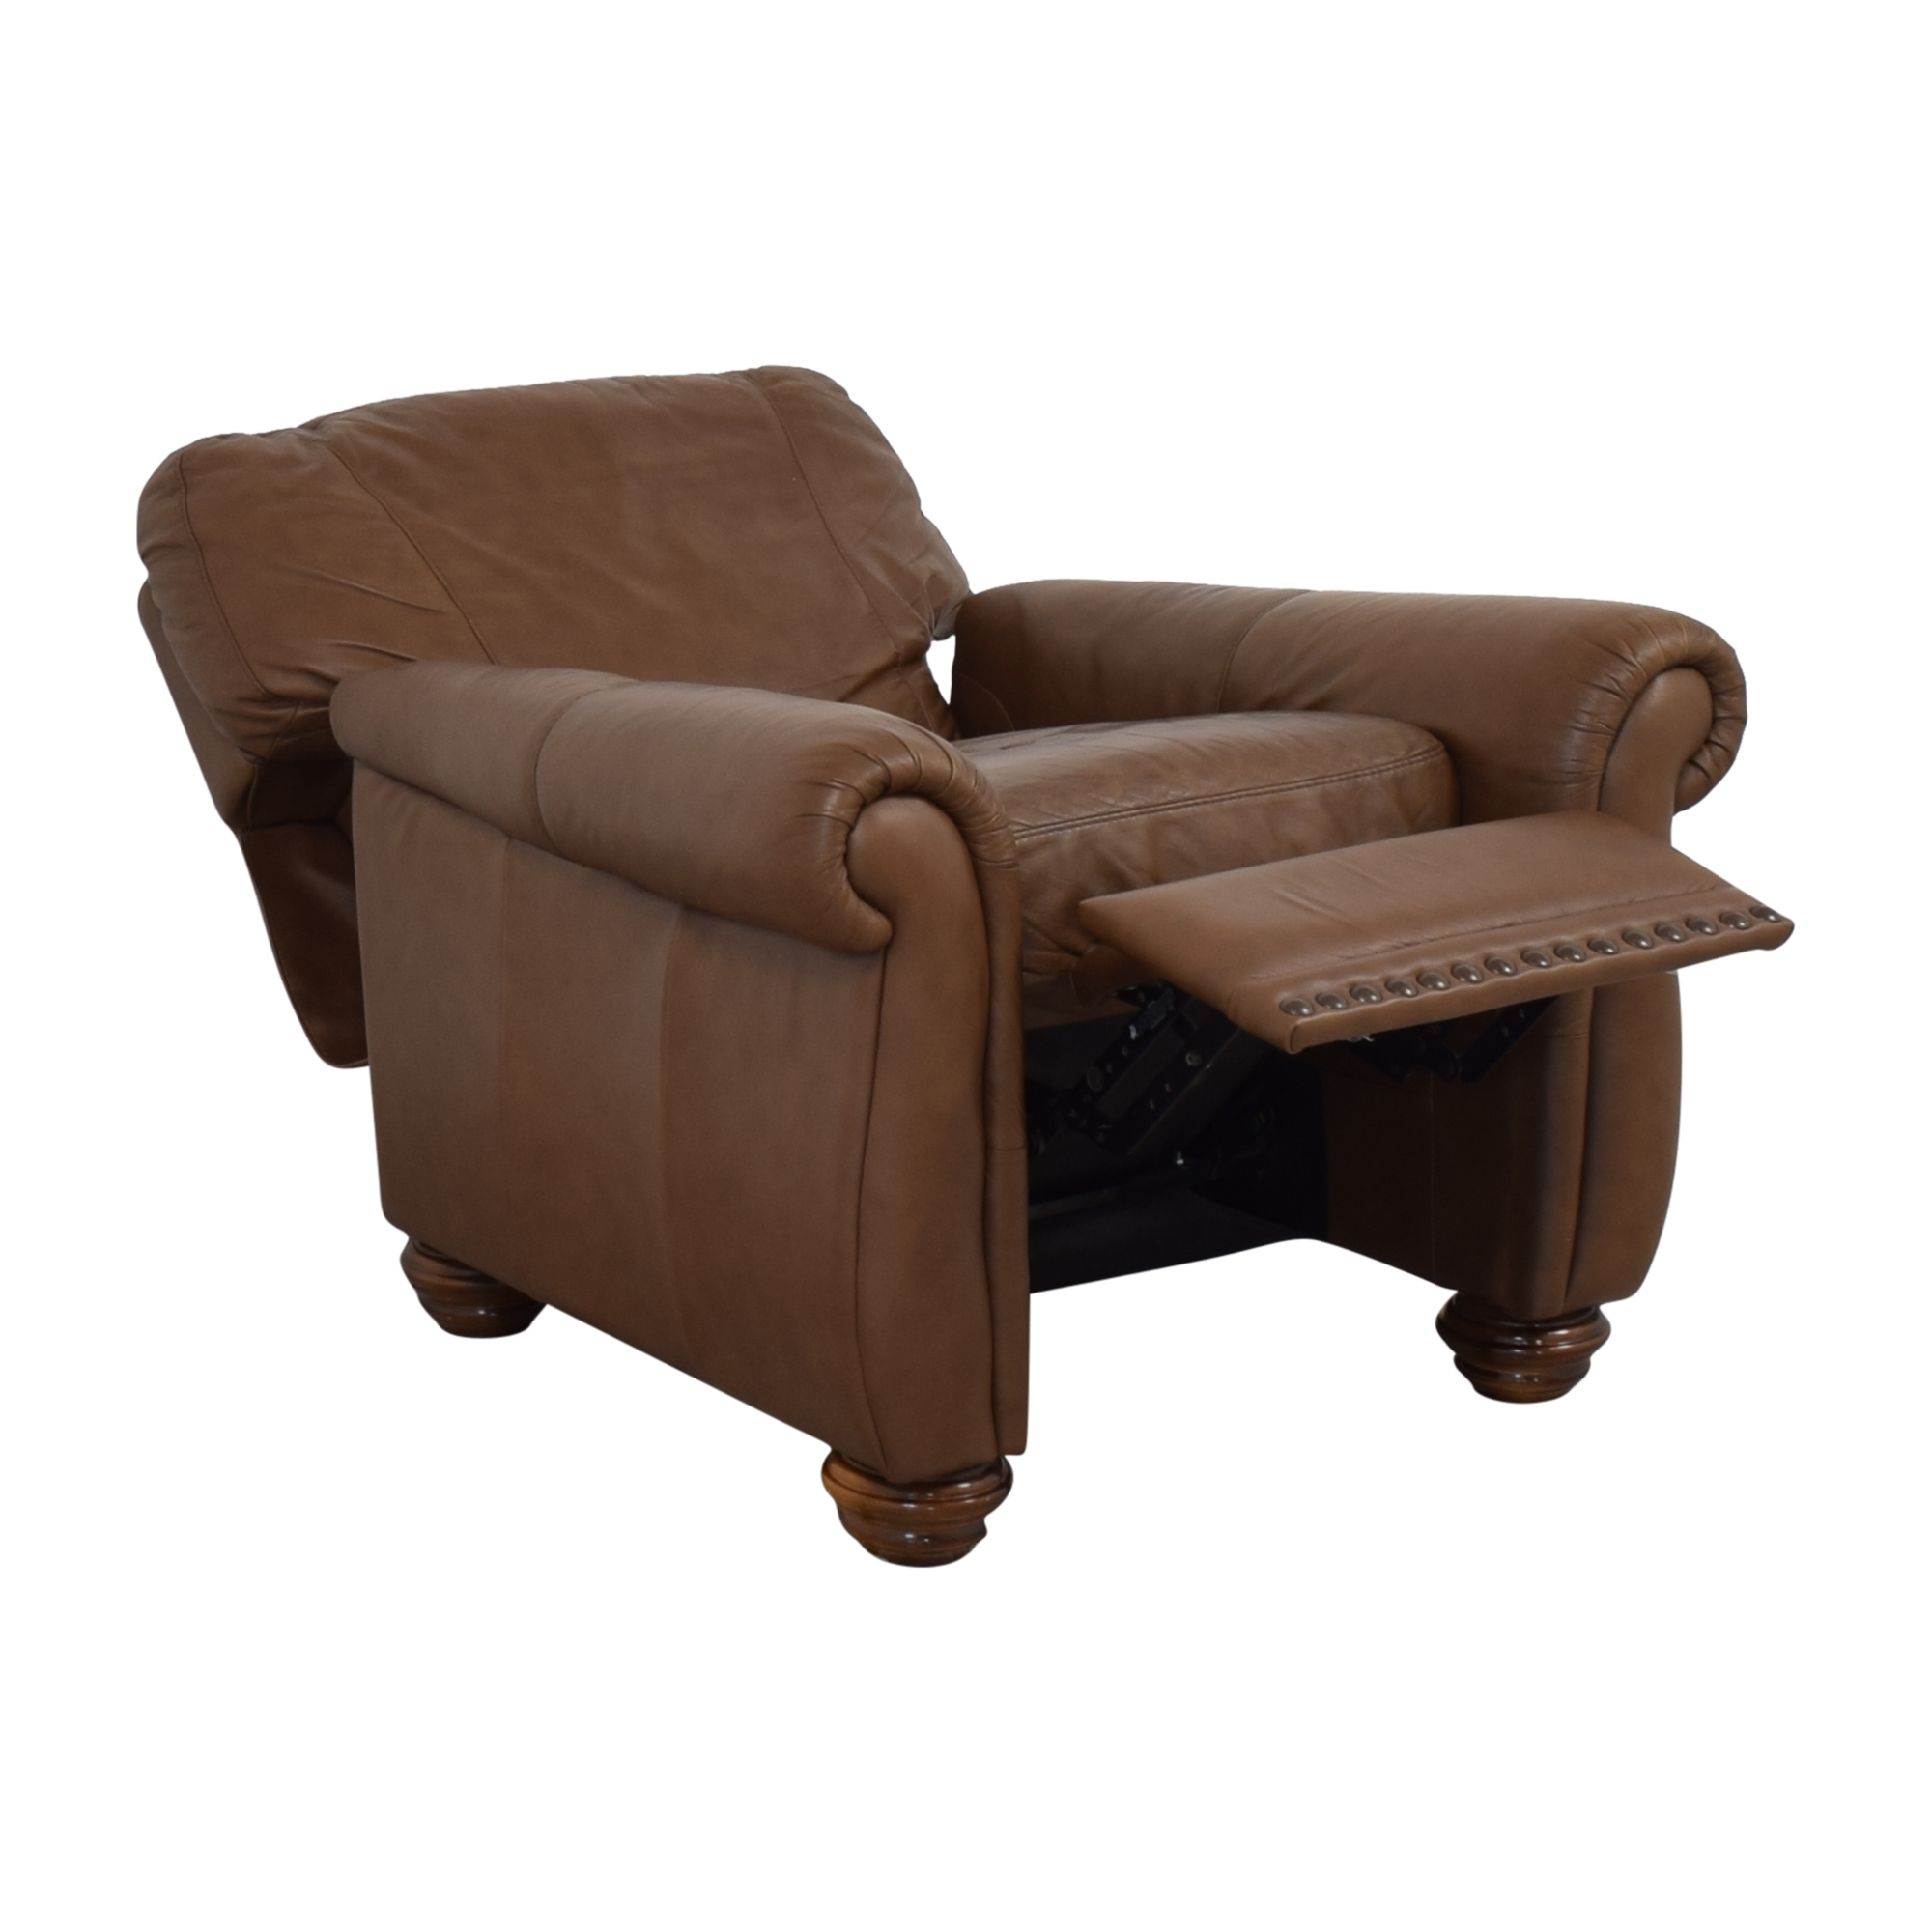 77 off raymour flanigan raymour flanigan natuzzi elba recliner chairs